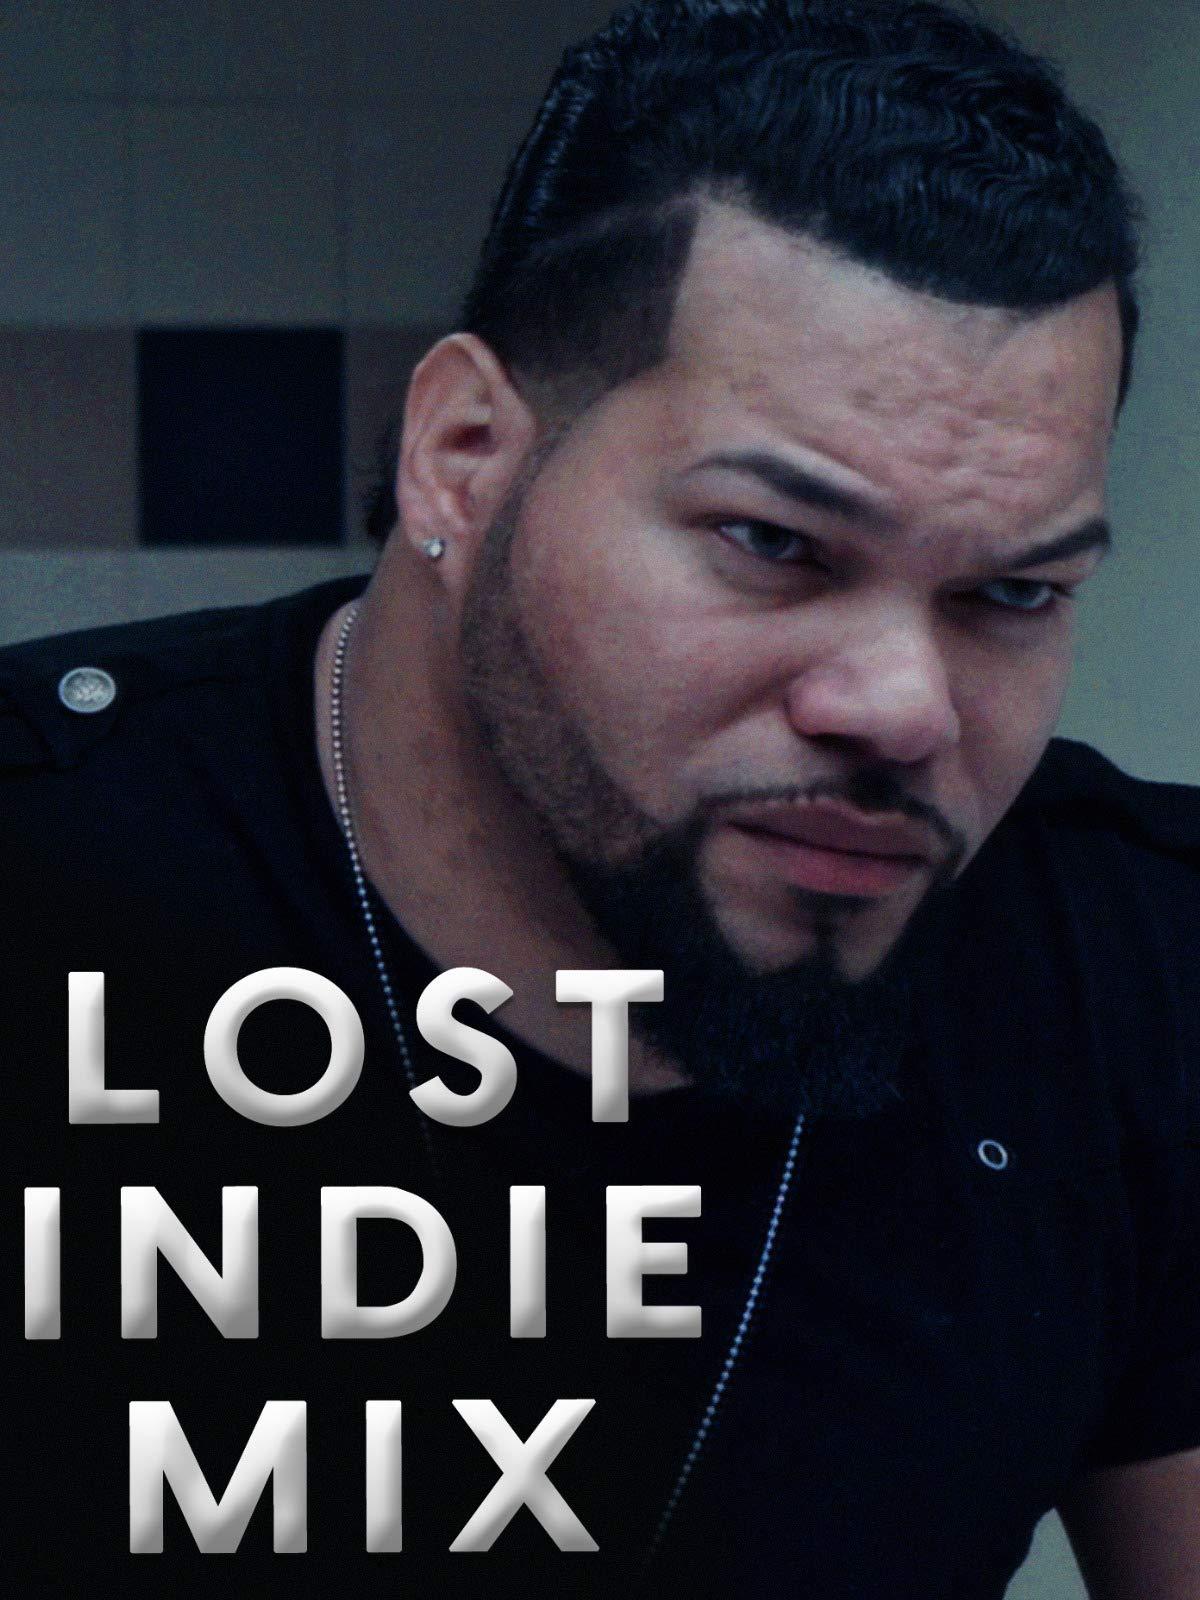 Lost Indie Mix